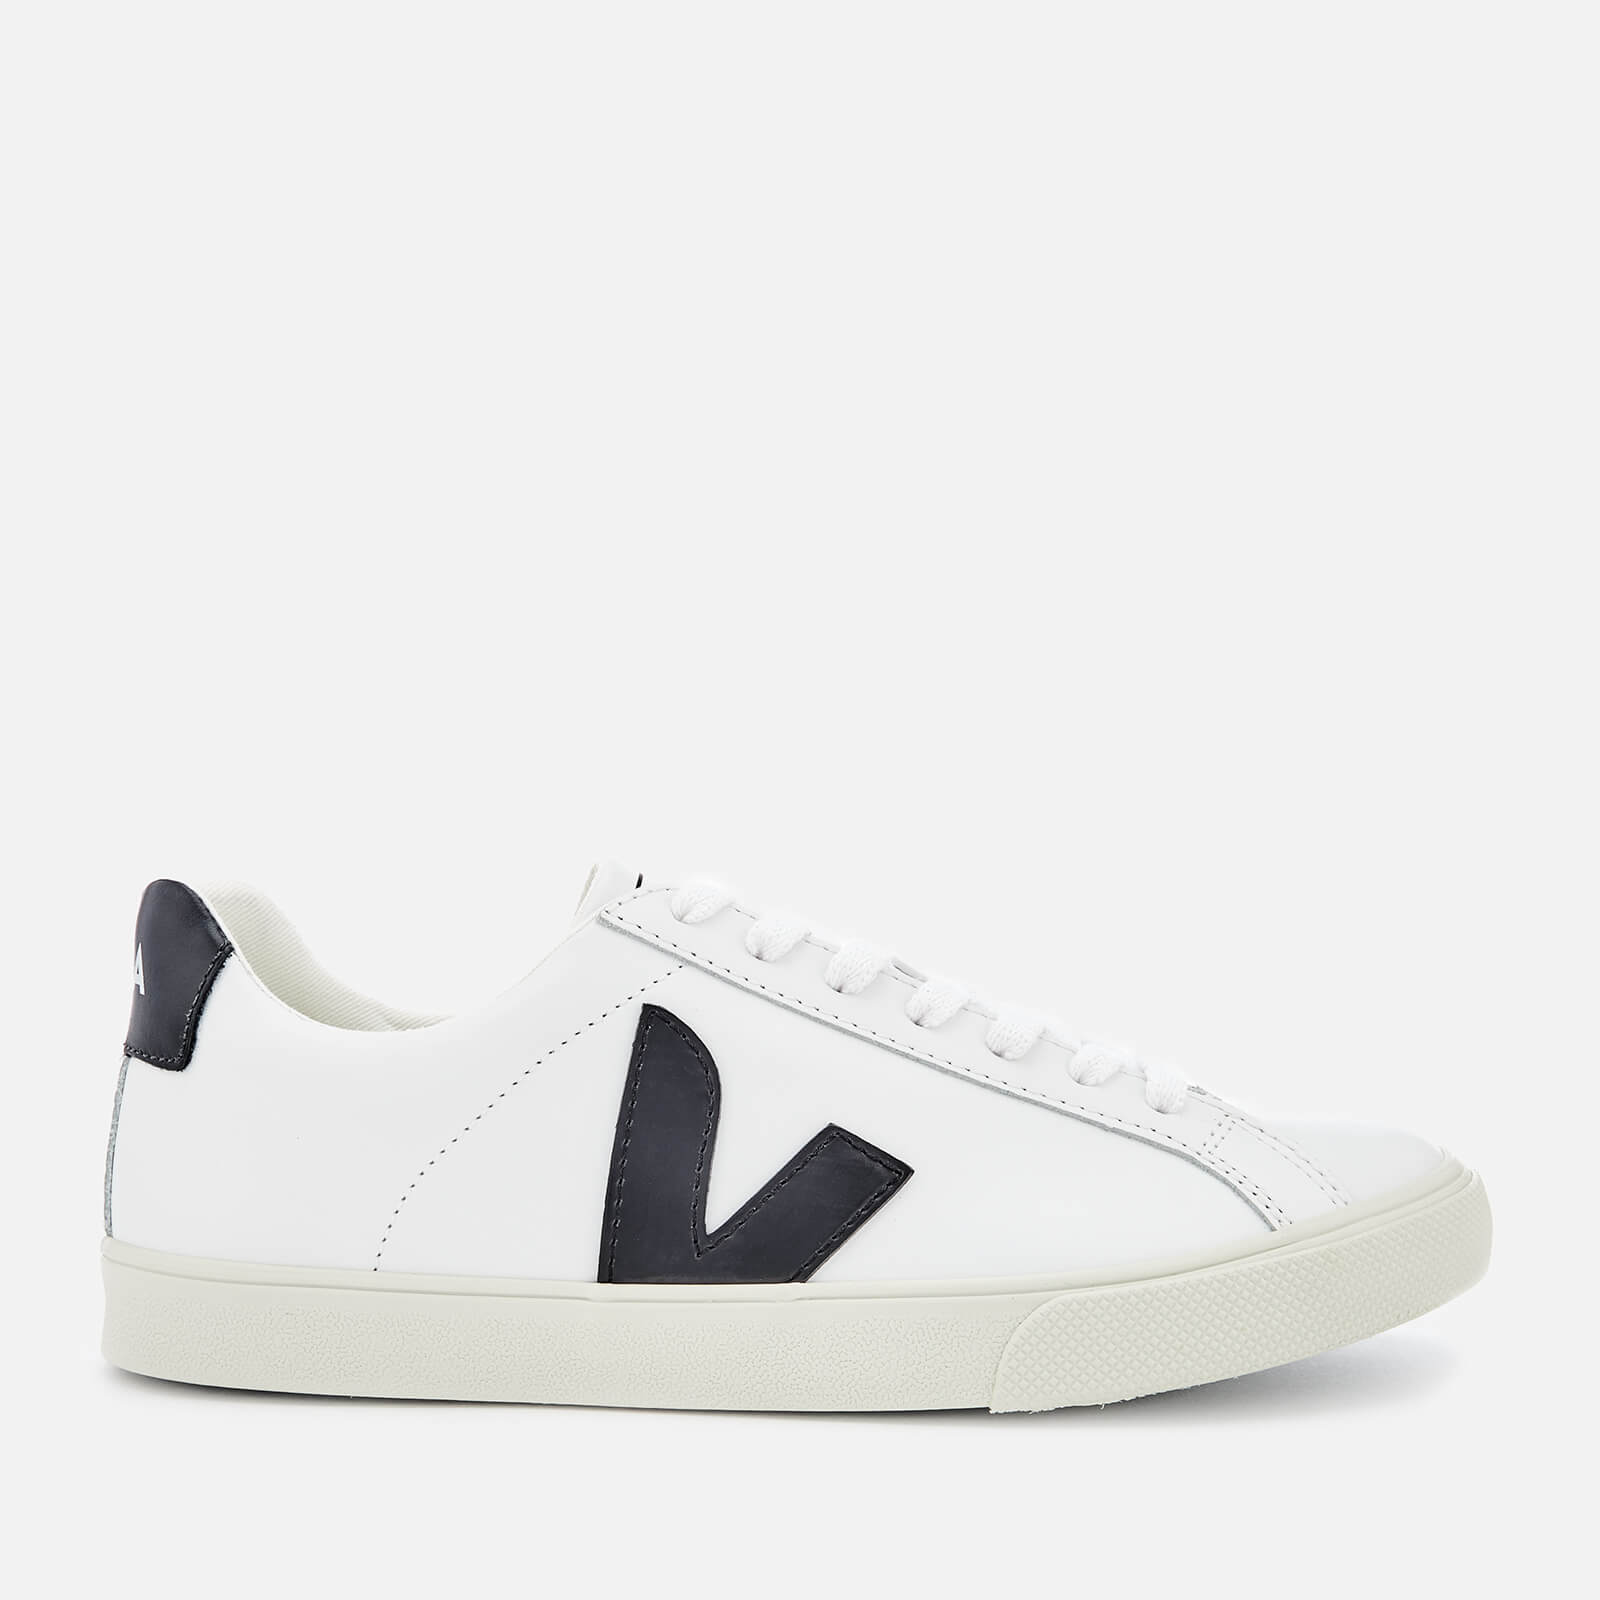 1ac1d59a5f6 Veja Women's Esplar Logo Leather Low Top Trainers - Extra White/Black